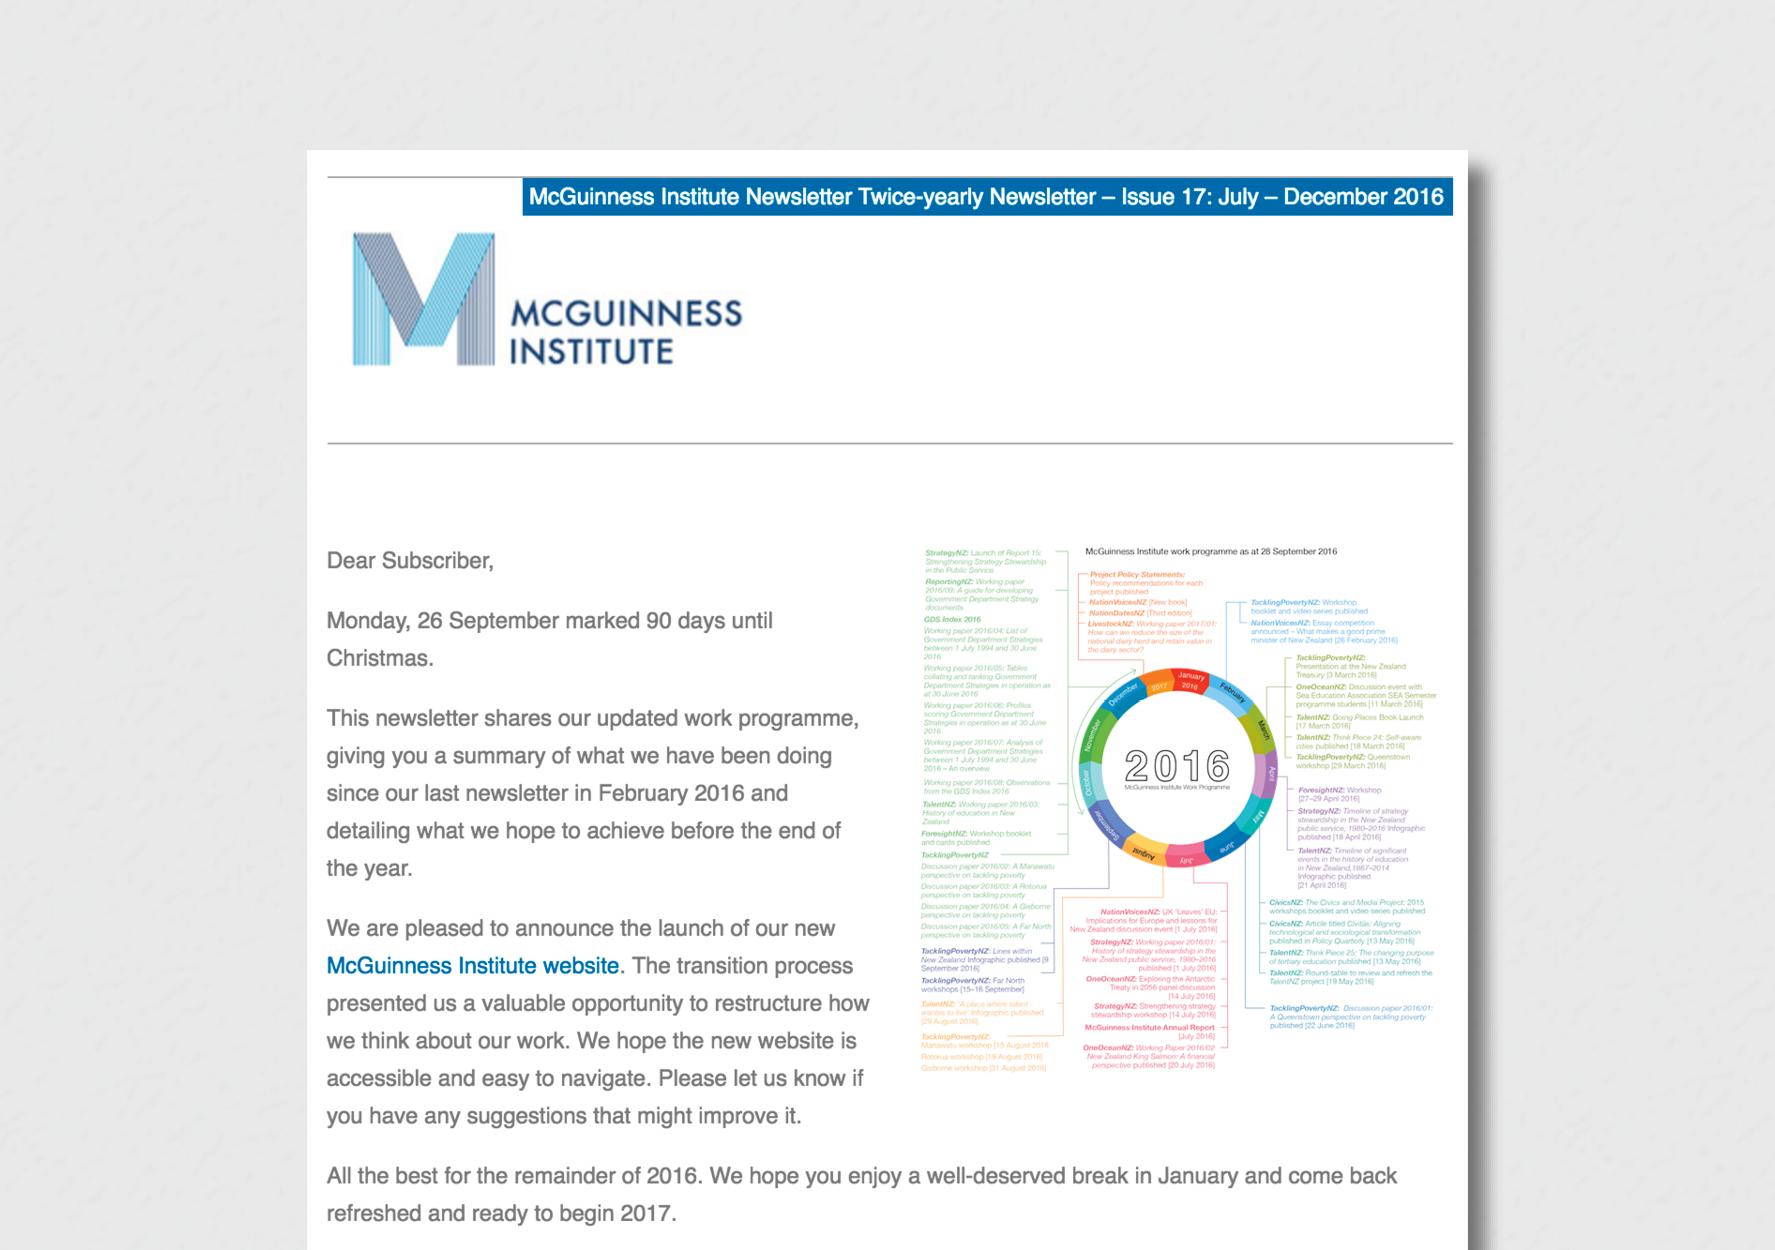 mcguinness-institute-newsletter-issue-17